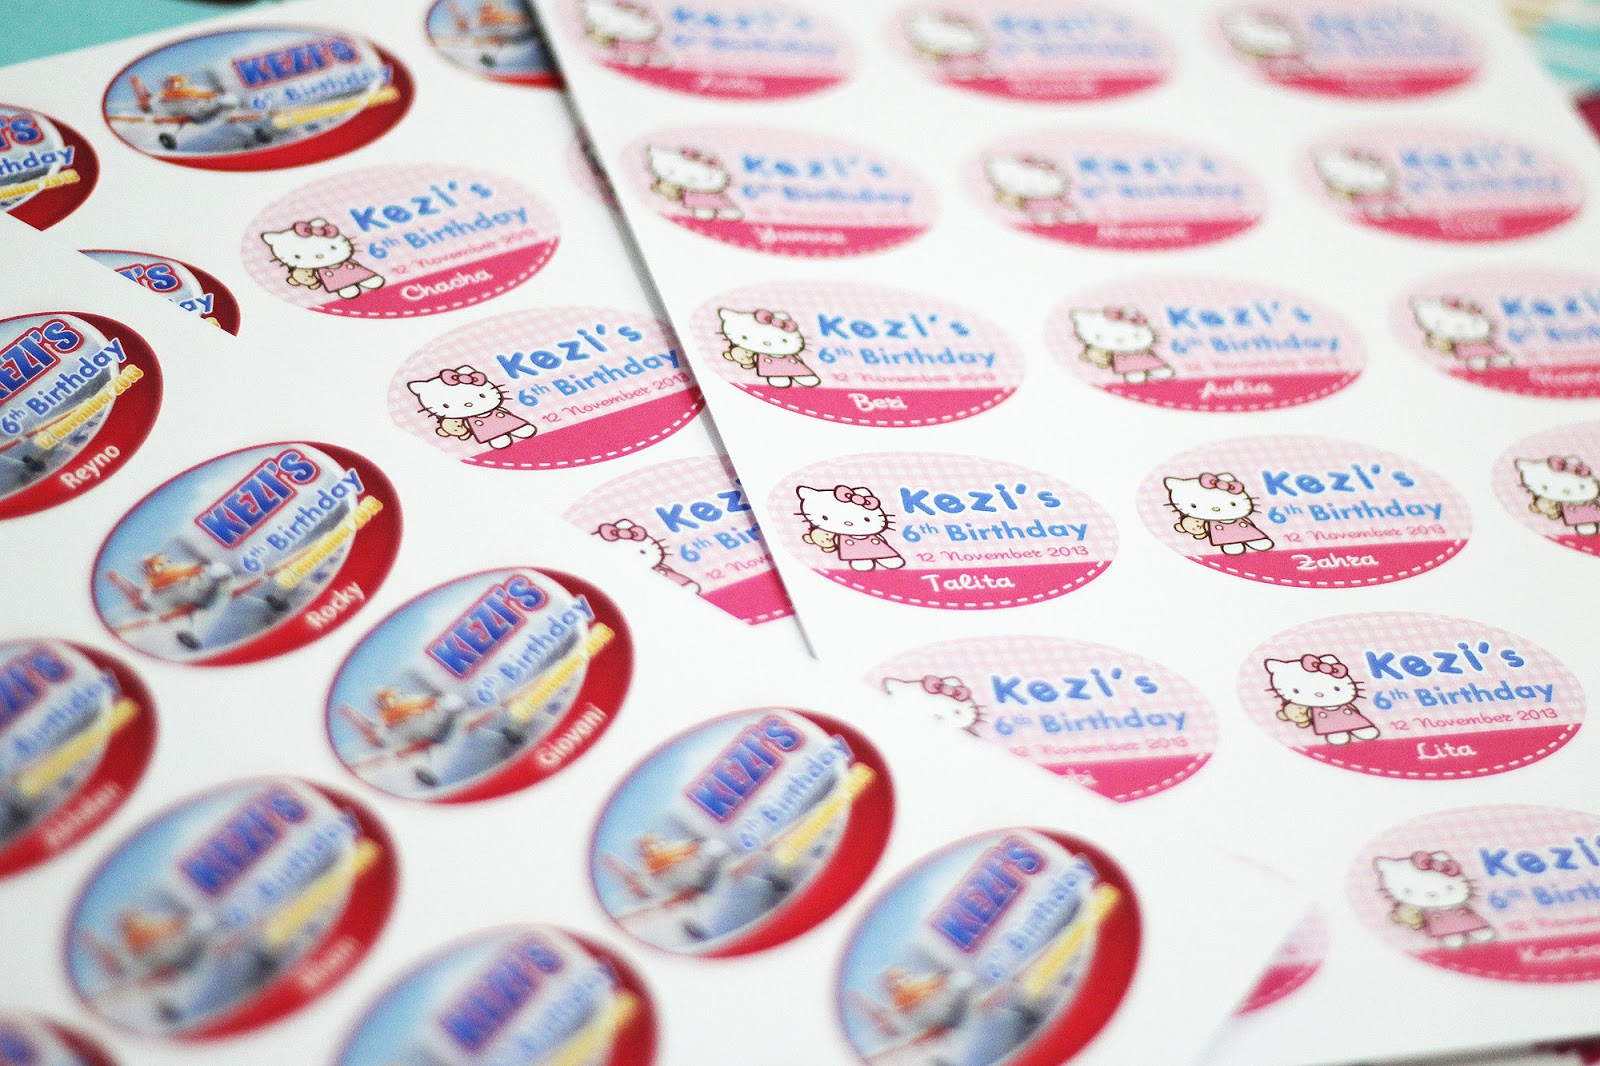 Comment on this picture ulang tahun anak contoh undangan kartu apps - Stiker Ulang Tahun Hello Kitty Dan